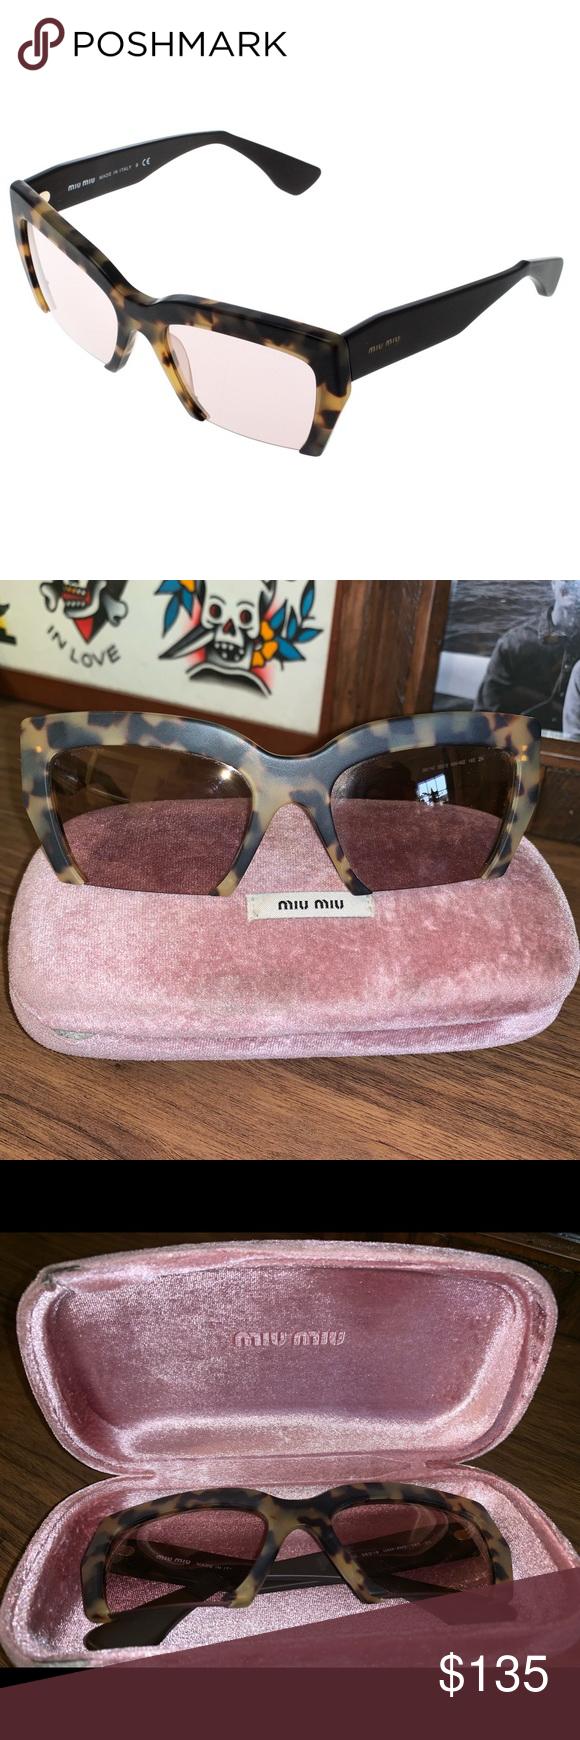 2d5eca87169b Miu Miu Tortiseshell Raisor half rim sunglasses Worn for a photo shoot. No  flaws whatsoever